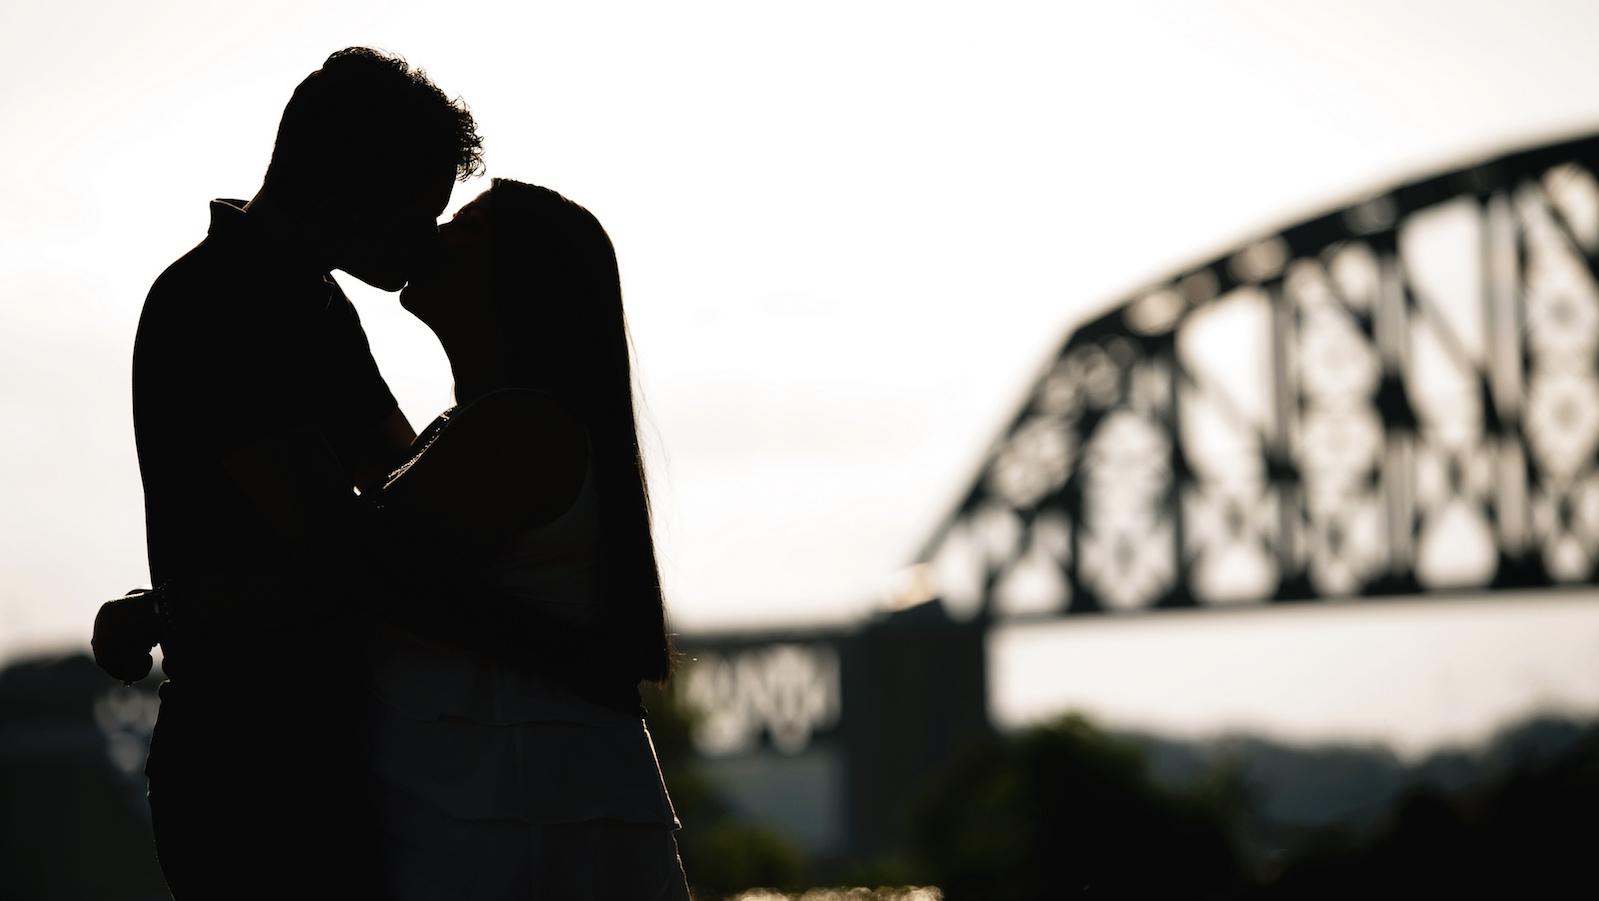 couple_silhouette